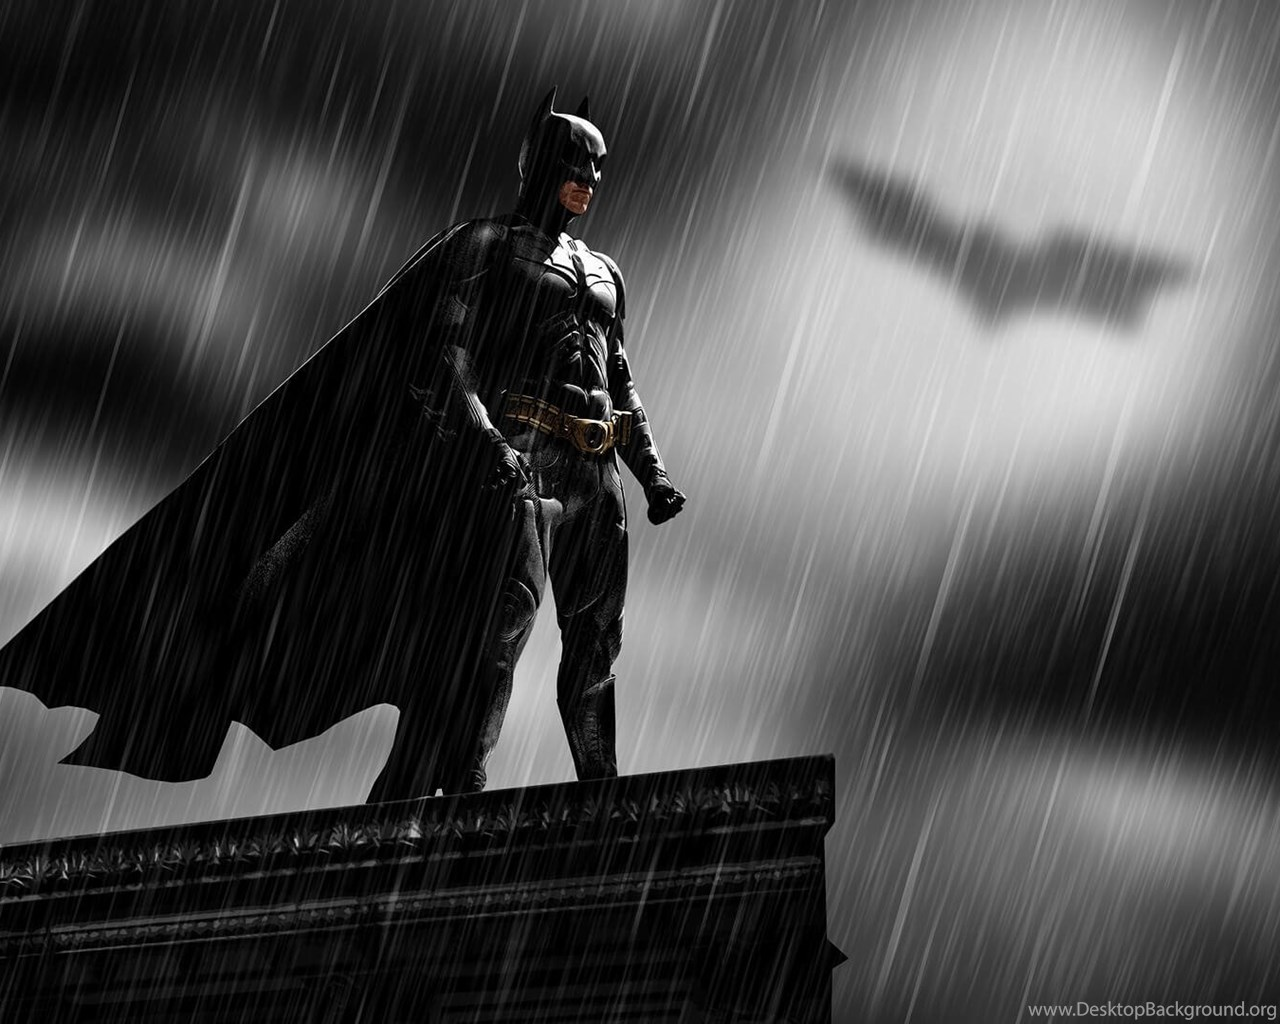 batman hd wallpapers pack desktop background